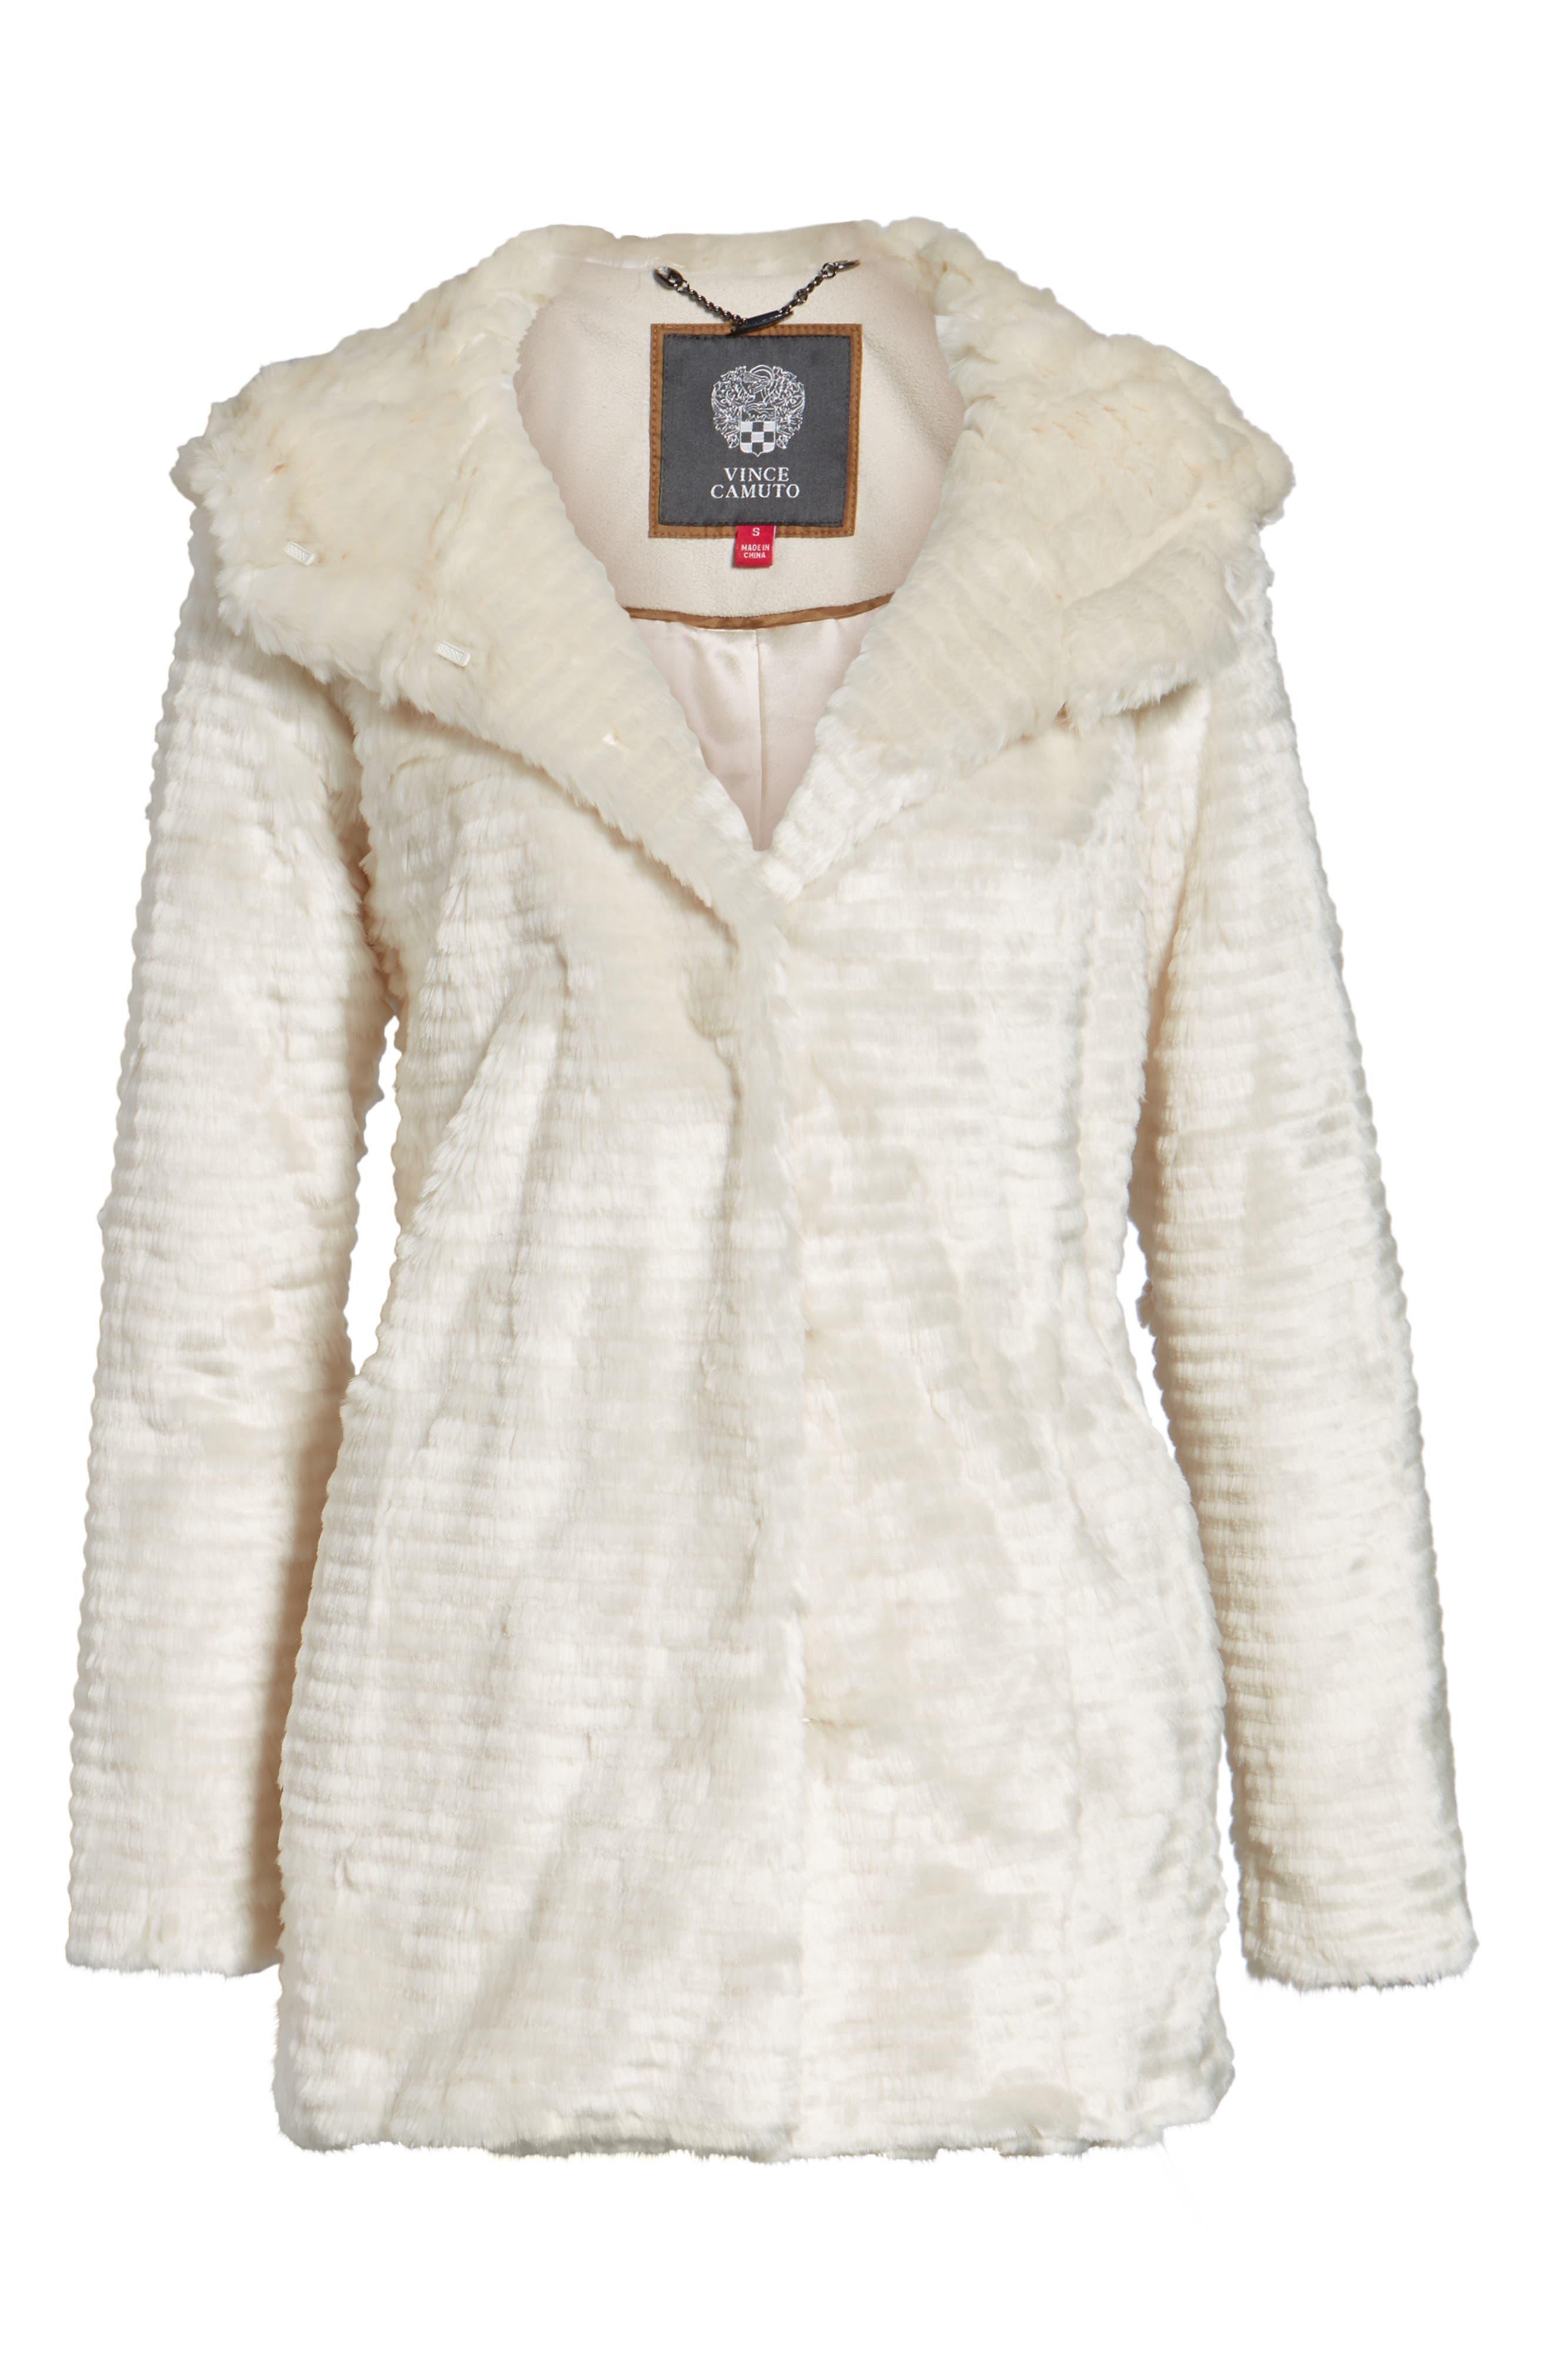 VINCE CAMUTO,                             Hooded Faux Fur Coat,                             Alternate thumbnail 5, color,                             100